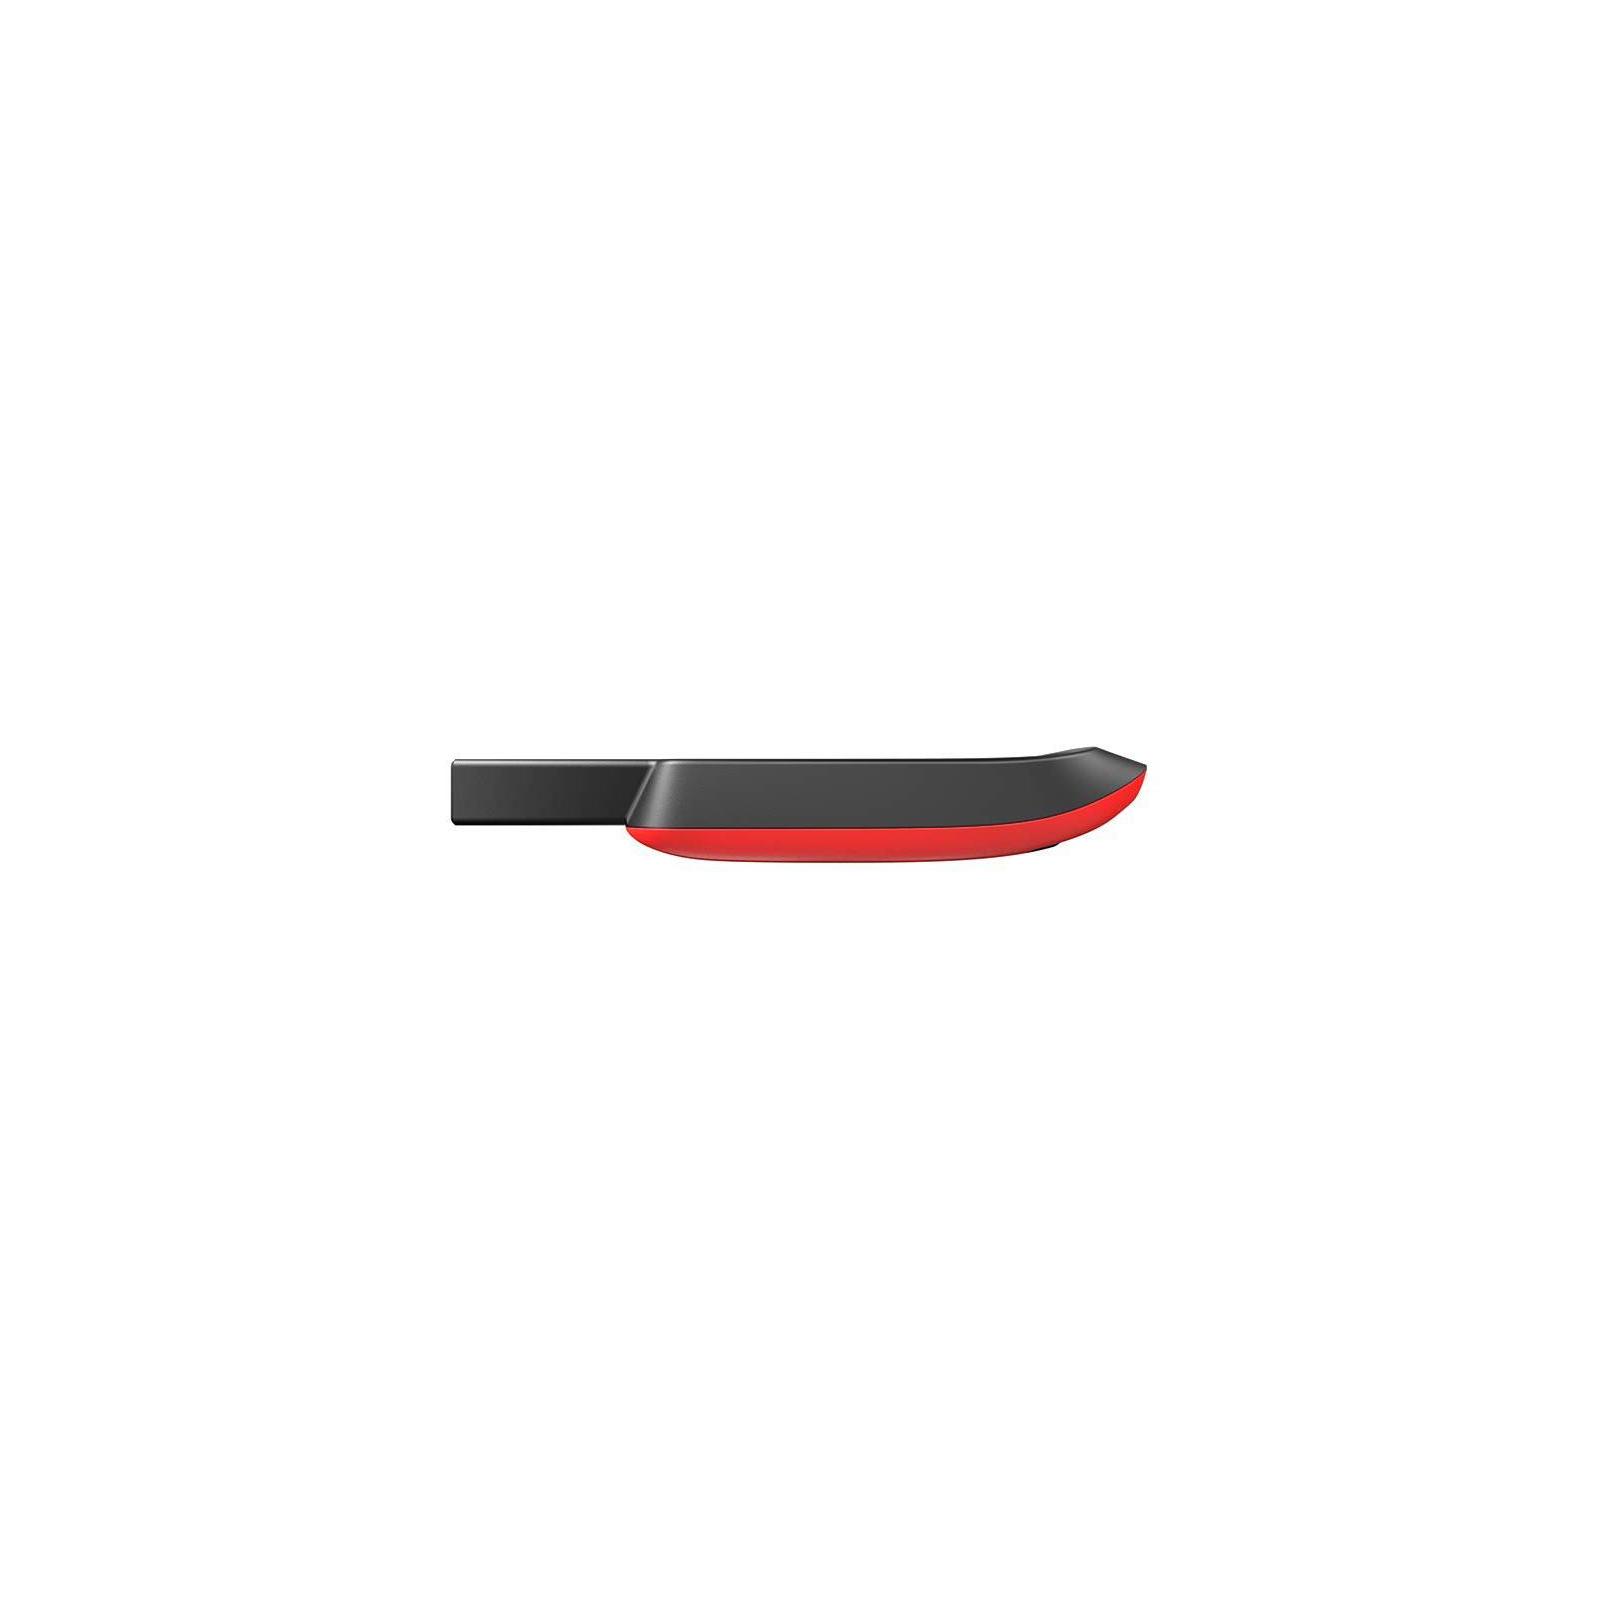 USB флеш накопитель SanDisk 16GB Cruzer Spark USB 2.0 (SDCZ61-016G-G35) изображение 6